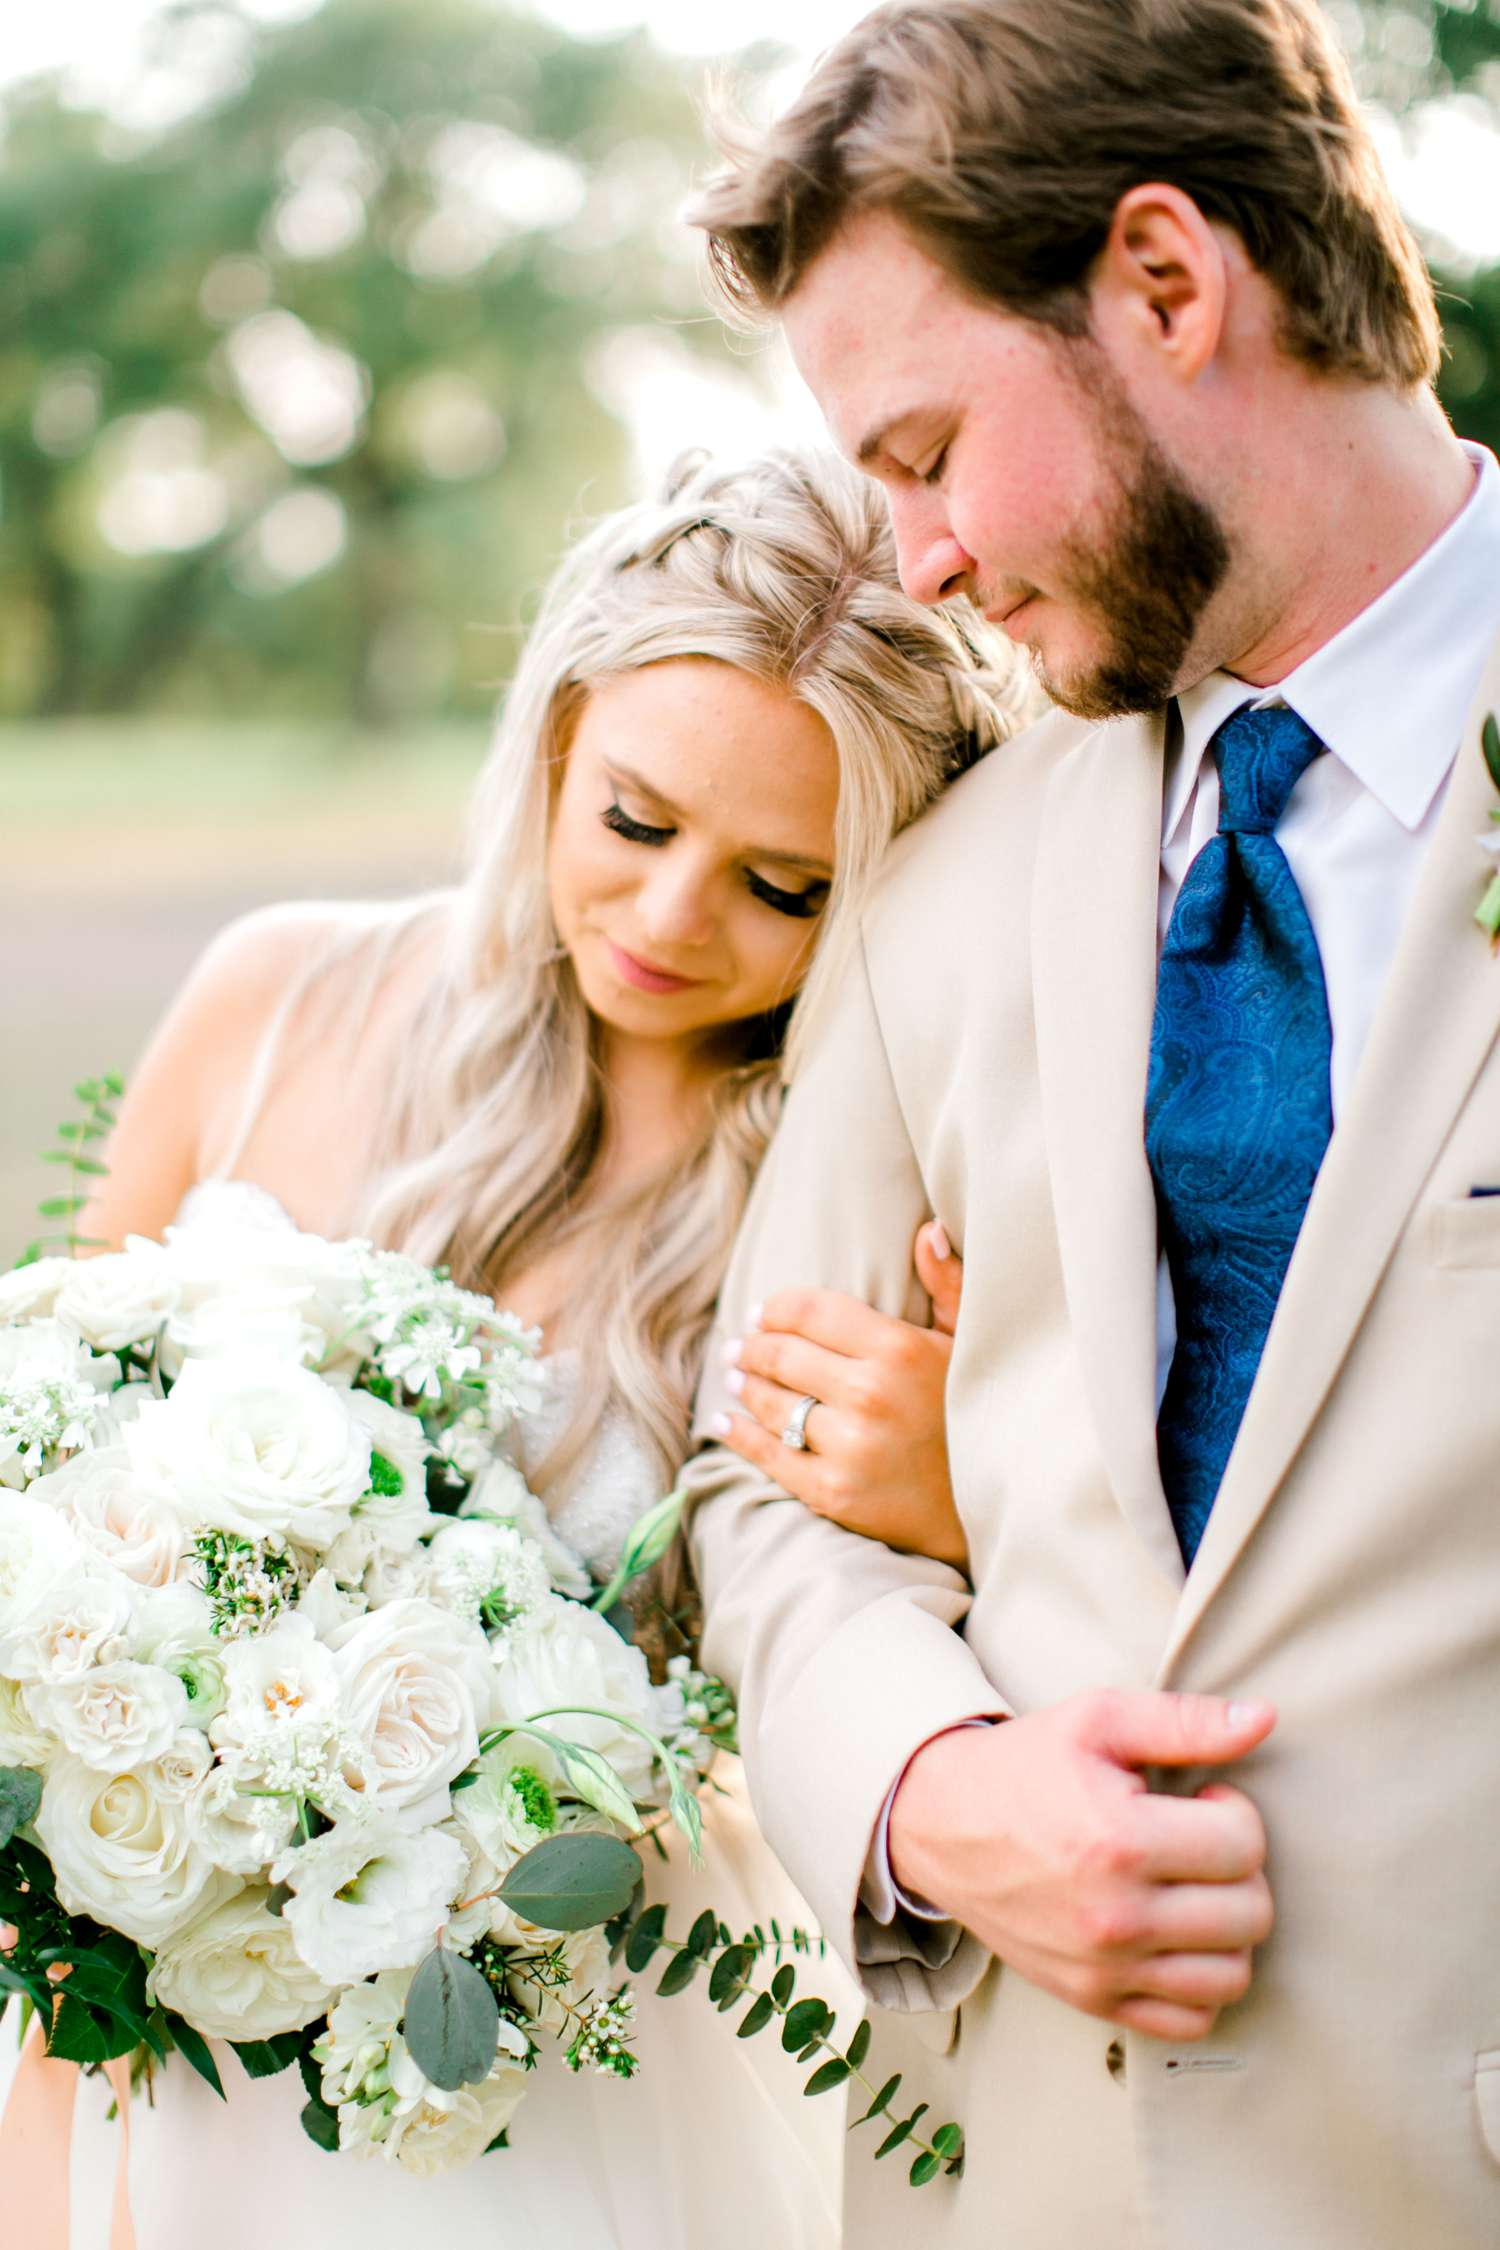 HAYLEE+JUSTIN+GREGORY+HERITAGE_HAUS_AUSTIN_TEXAS_WEDDING_0115.jpg